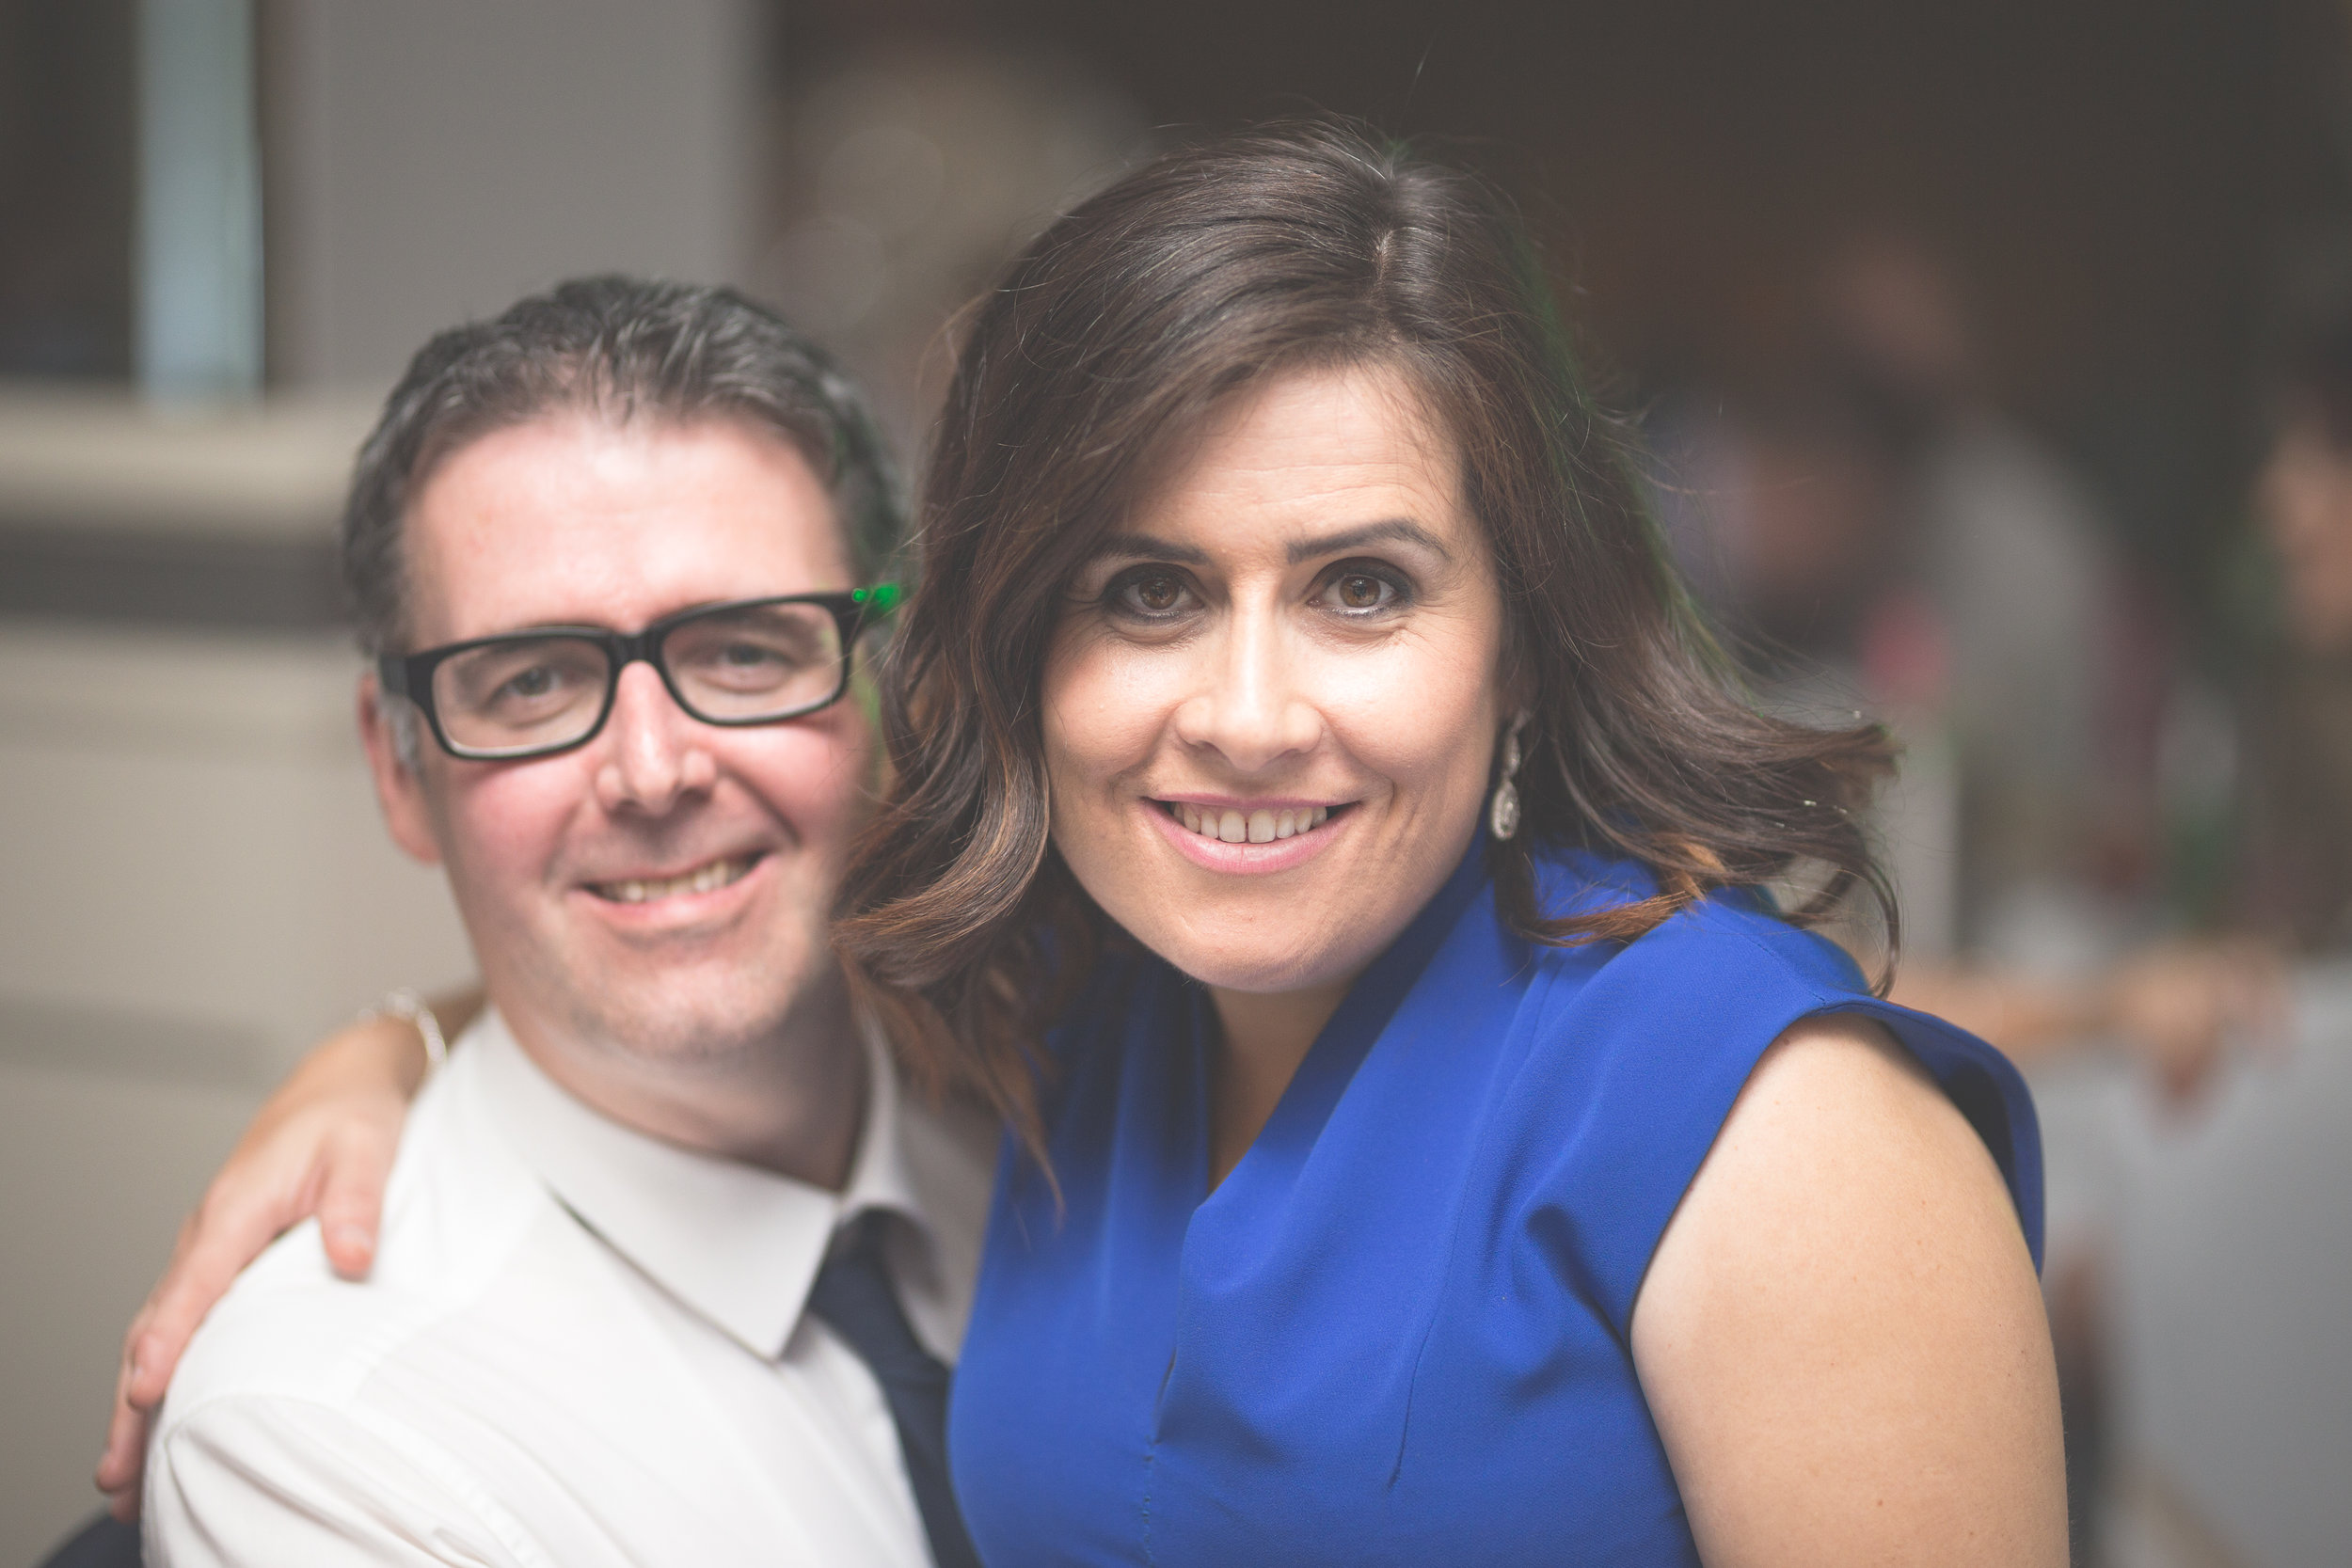 Antoinette & Stephen - First Dance | Brian McEwan Photography | Wedding Photographer Northern Ireland 68.jpg